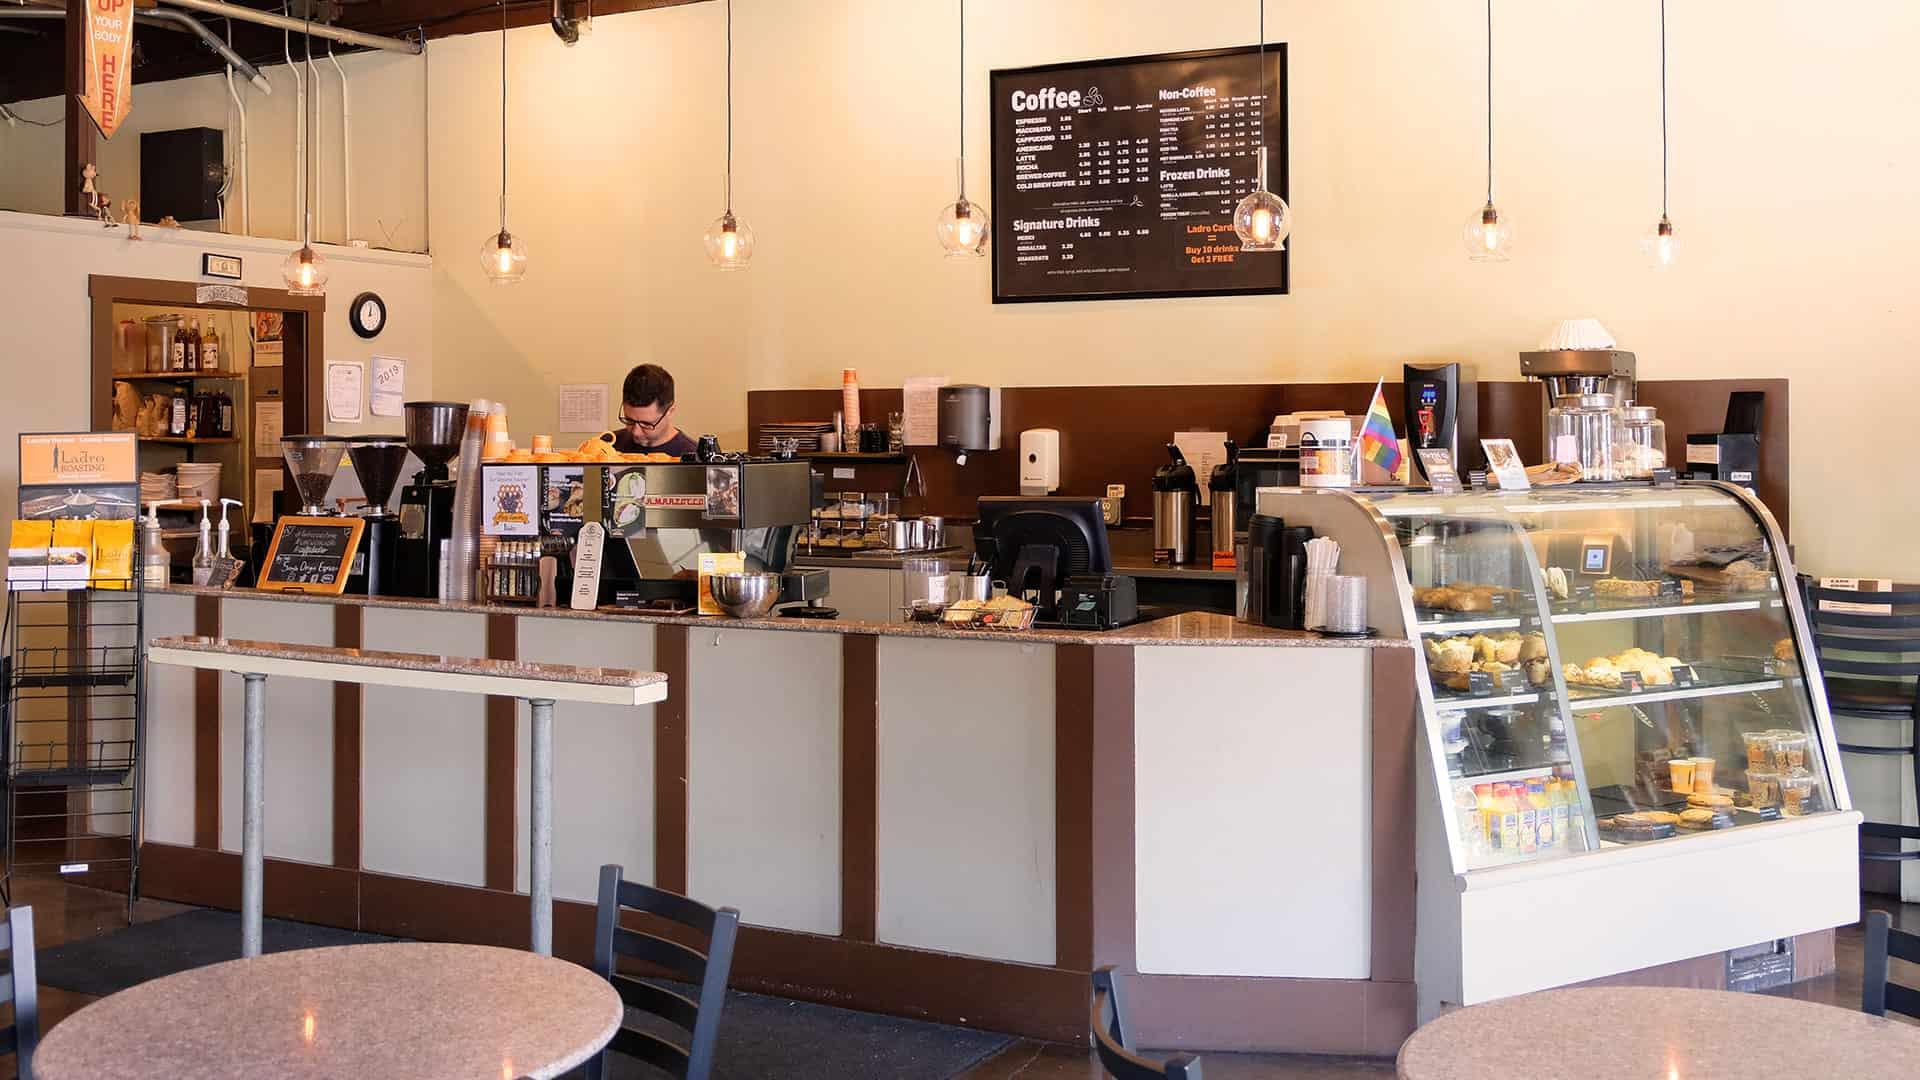 Fremont Caffe Ladro interior